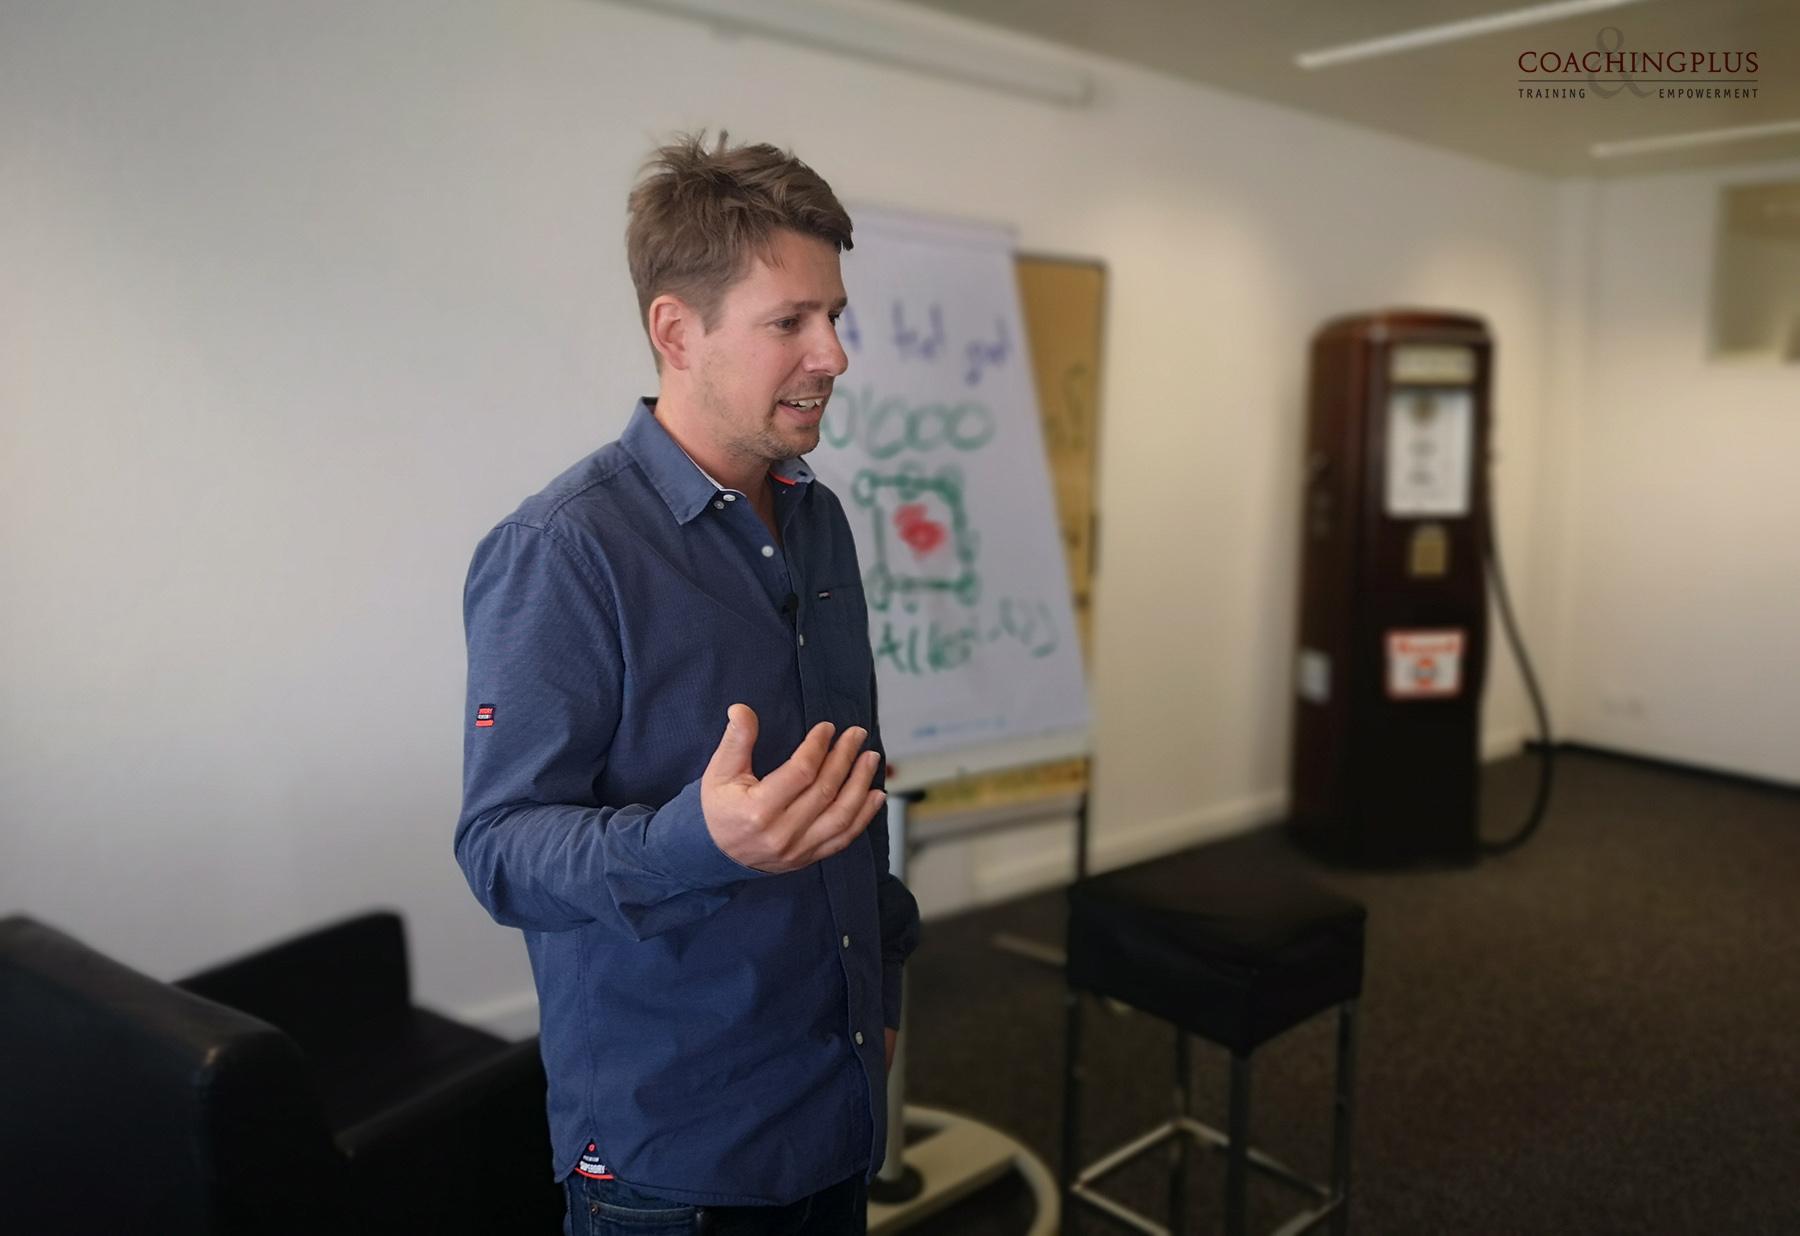 Marcel Hager Coachingplus - Ausbilder - Live-Streaming